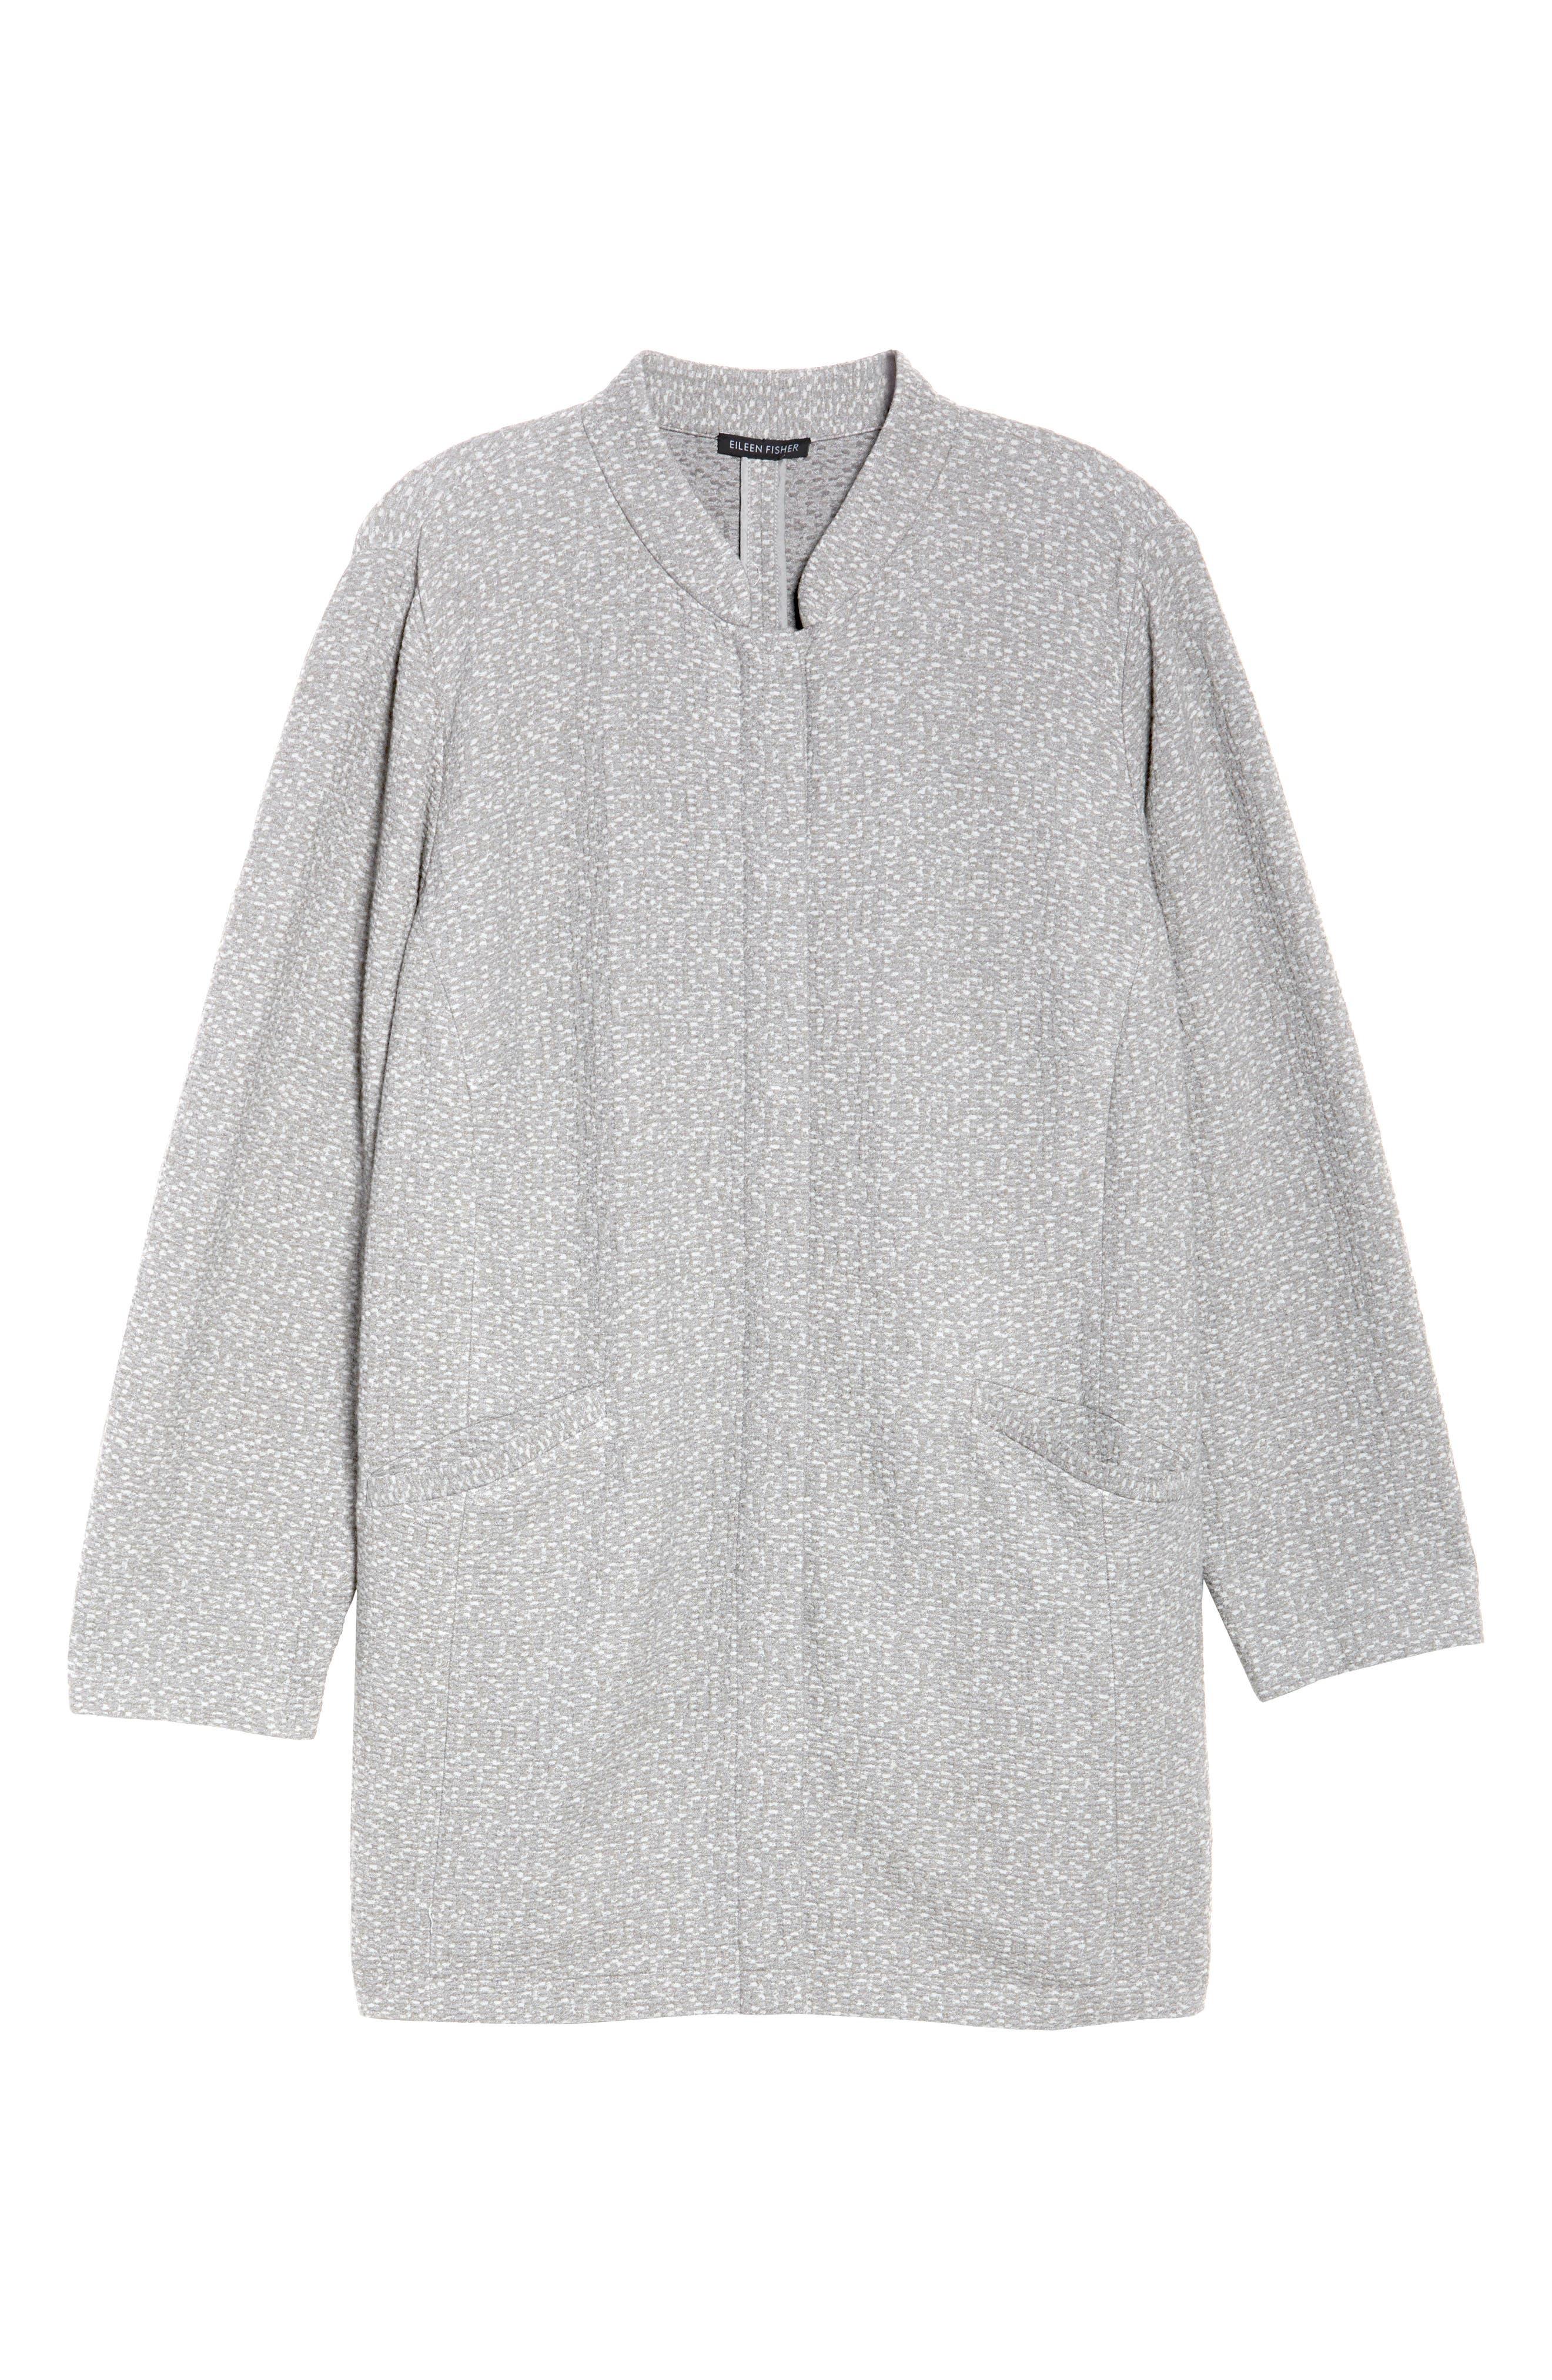 Tweed Jacket,                             Alternate thumbnail 5, color,                             022